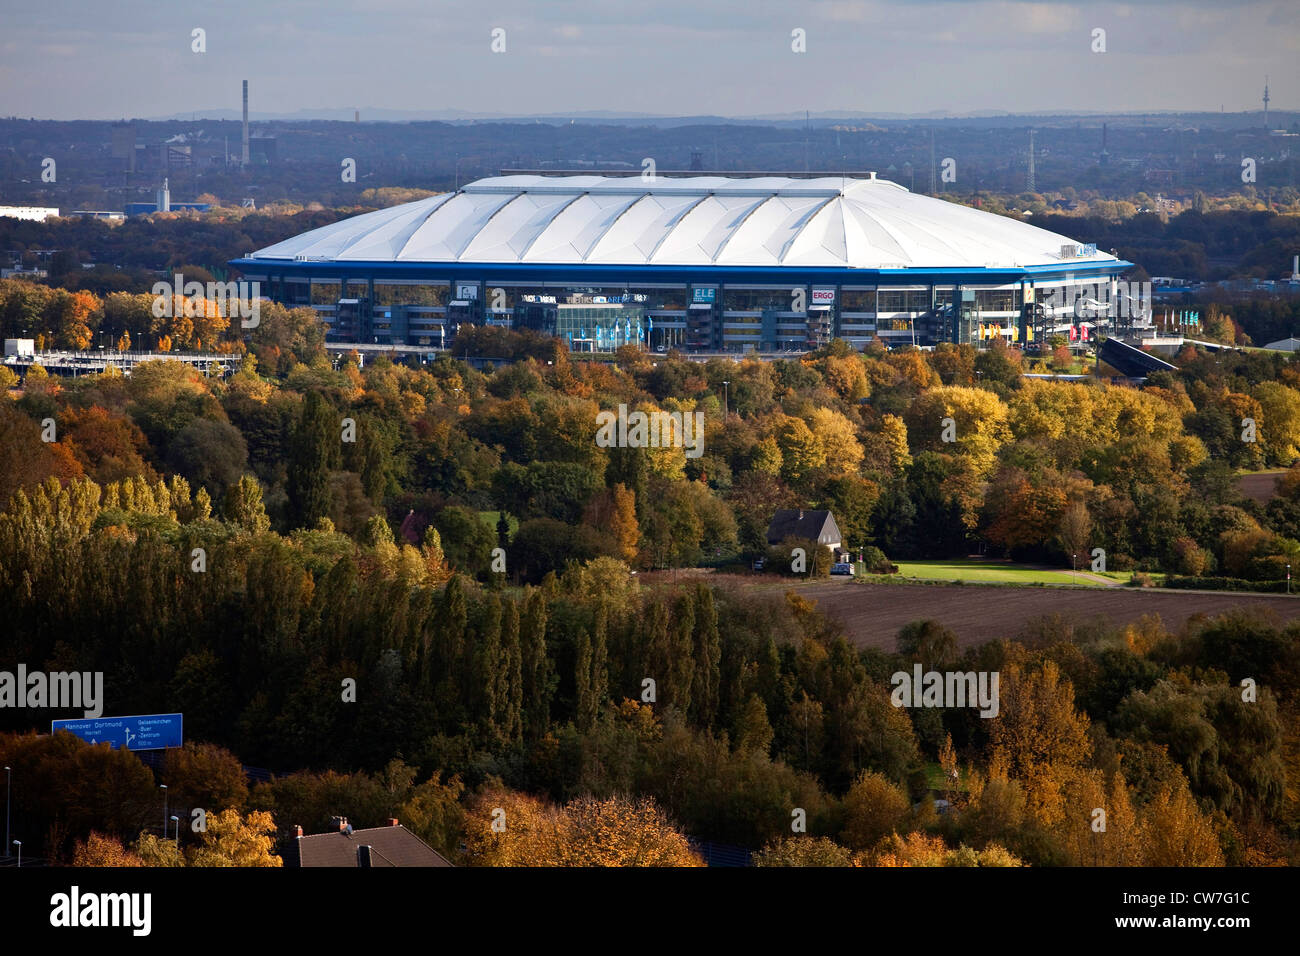 soccer stadium Veltins Arena at highway A2, Germany, North Rhine-Westphalia, Ruhr Area, Gelsenkirchen Stock Photo